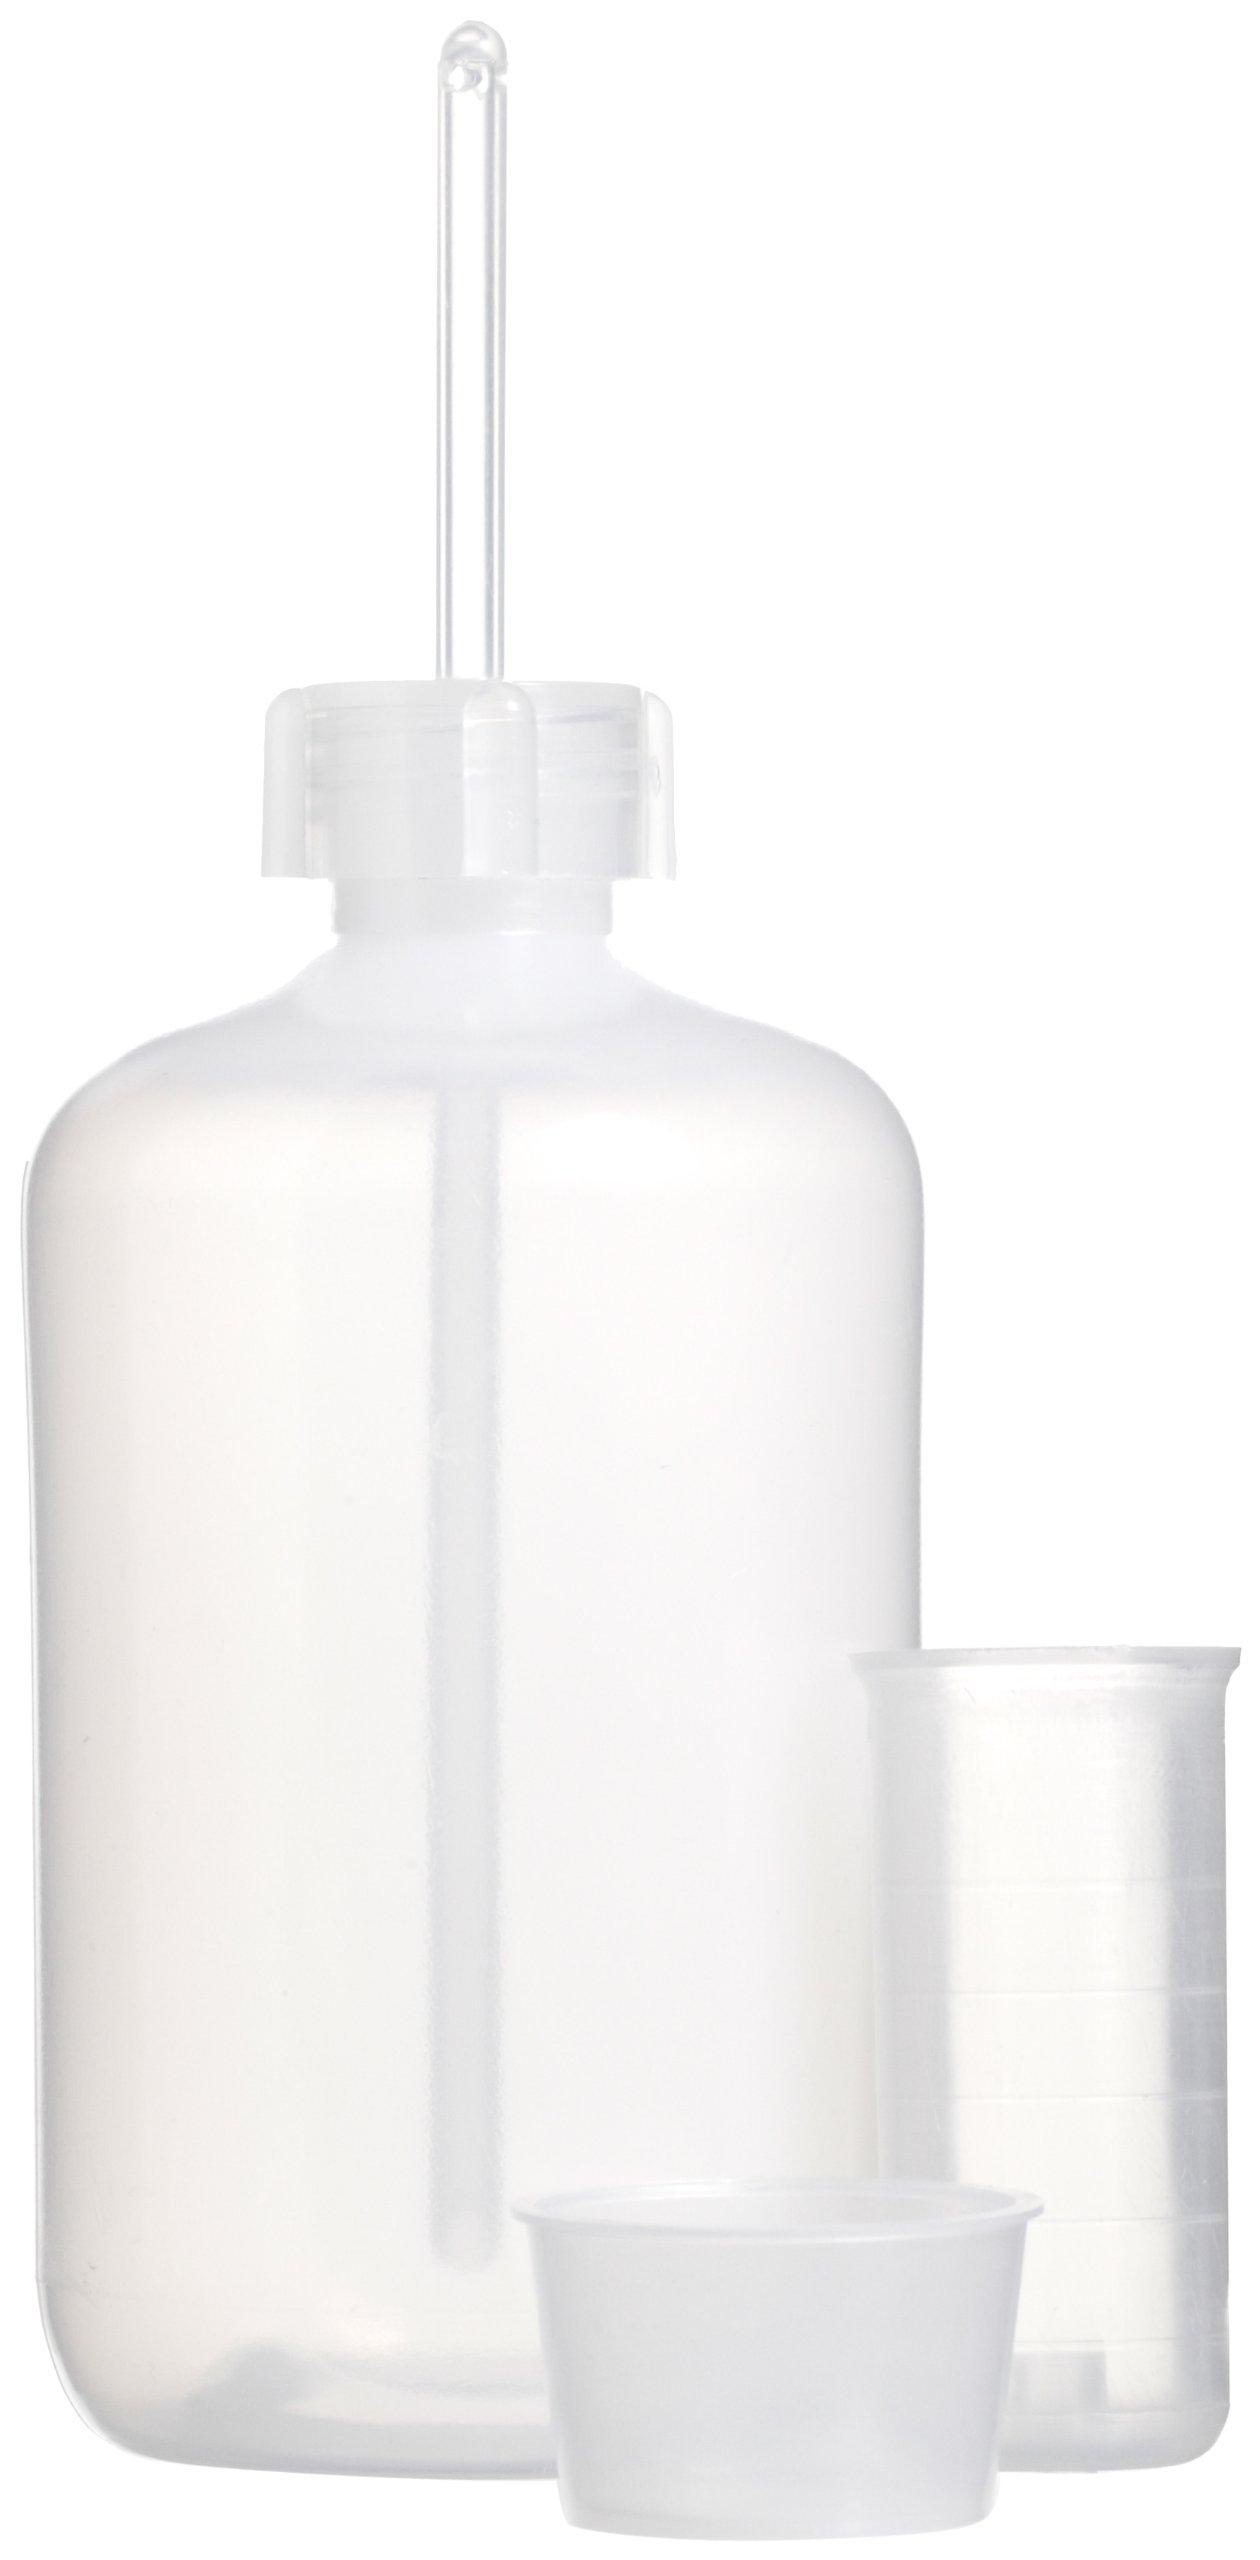 Bel-Art Measure-Matic Polypropylene Dispenser; Measures 5 to 25ml (F11654-0000)